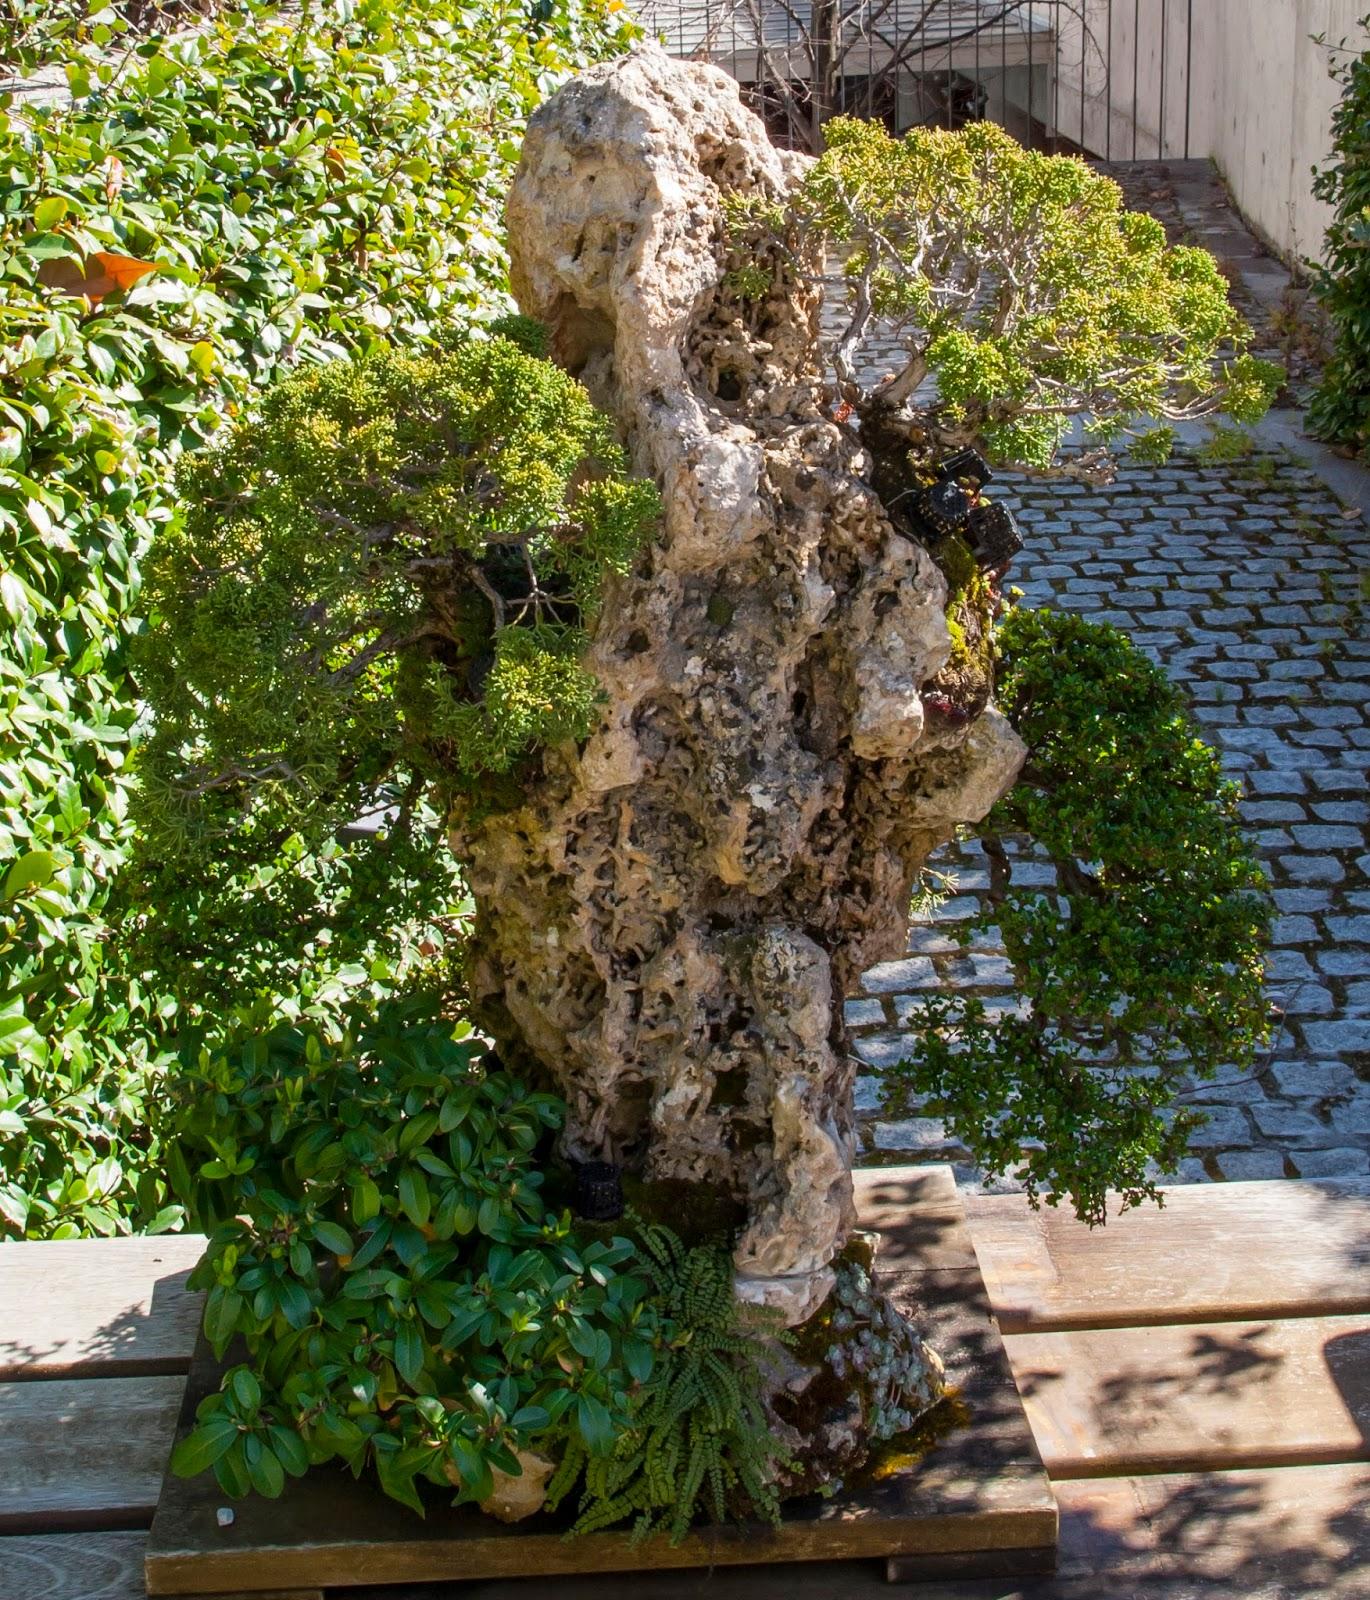 Orea bonsai colecci n de bons is del real jard n bot nico - Jardin de bonsais ...